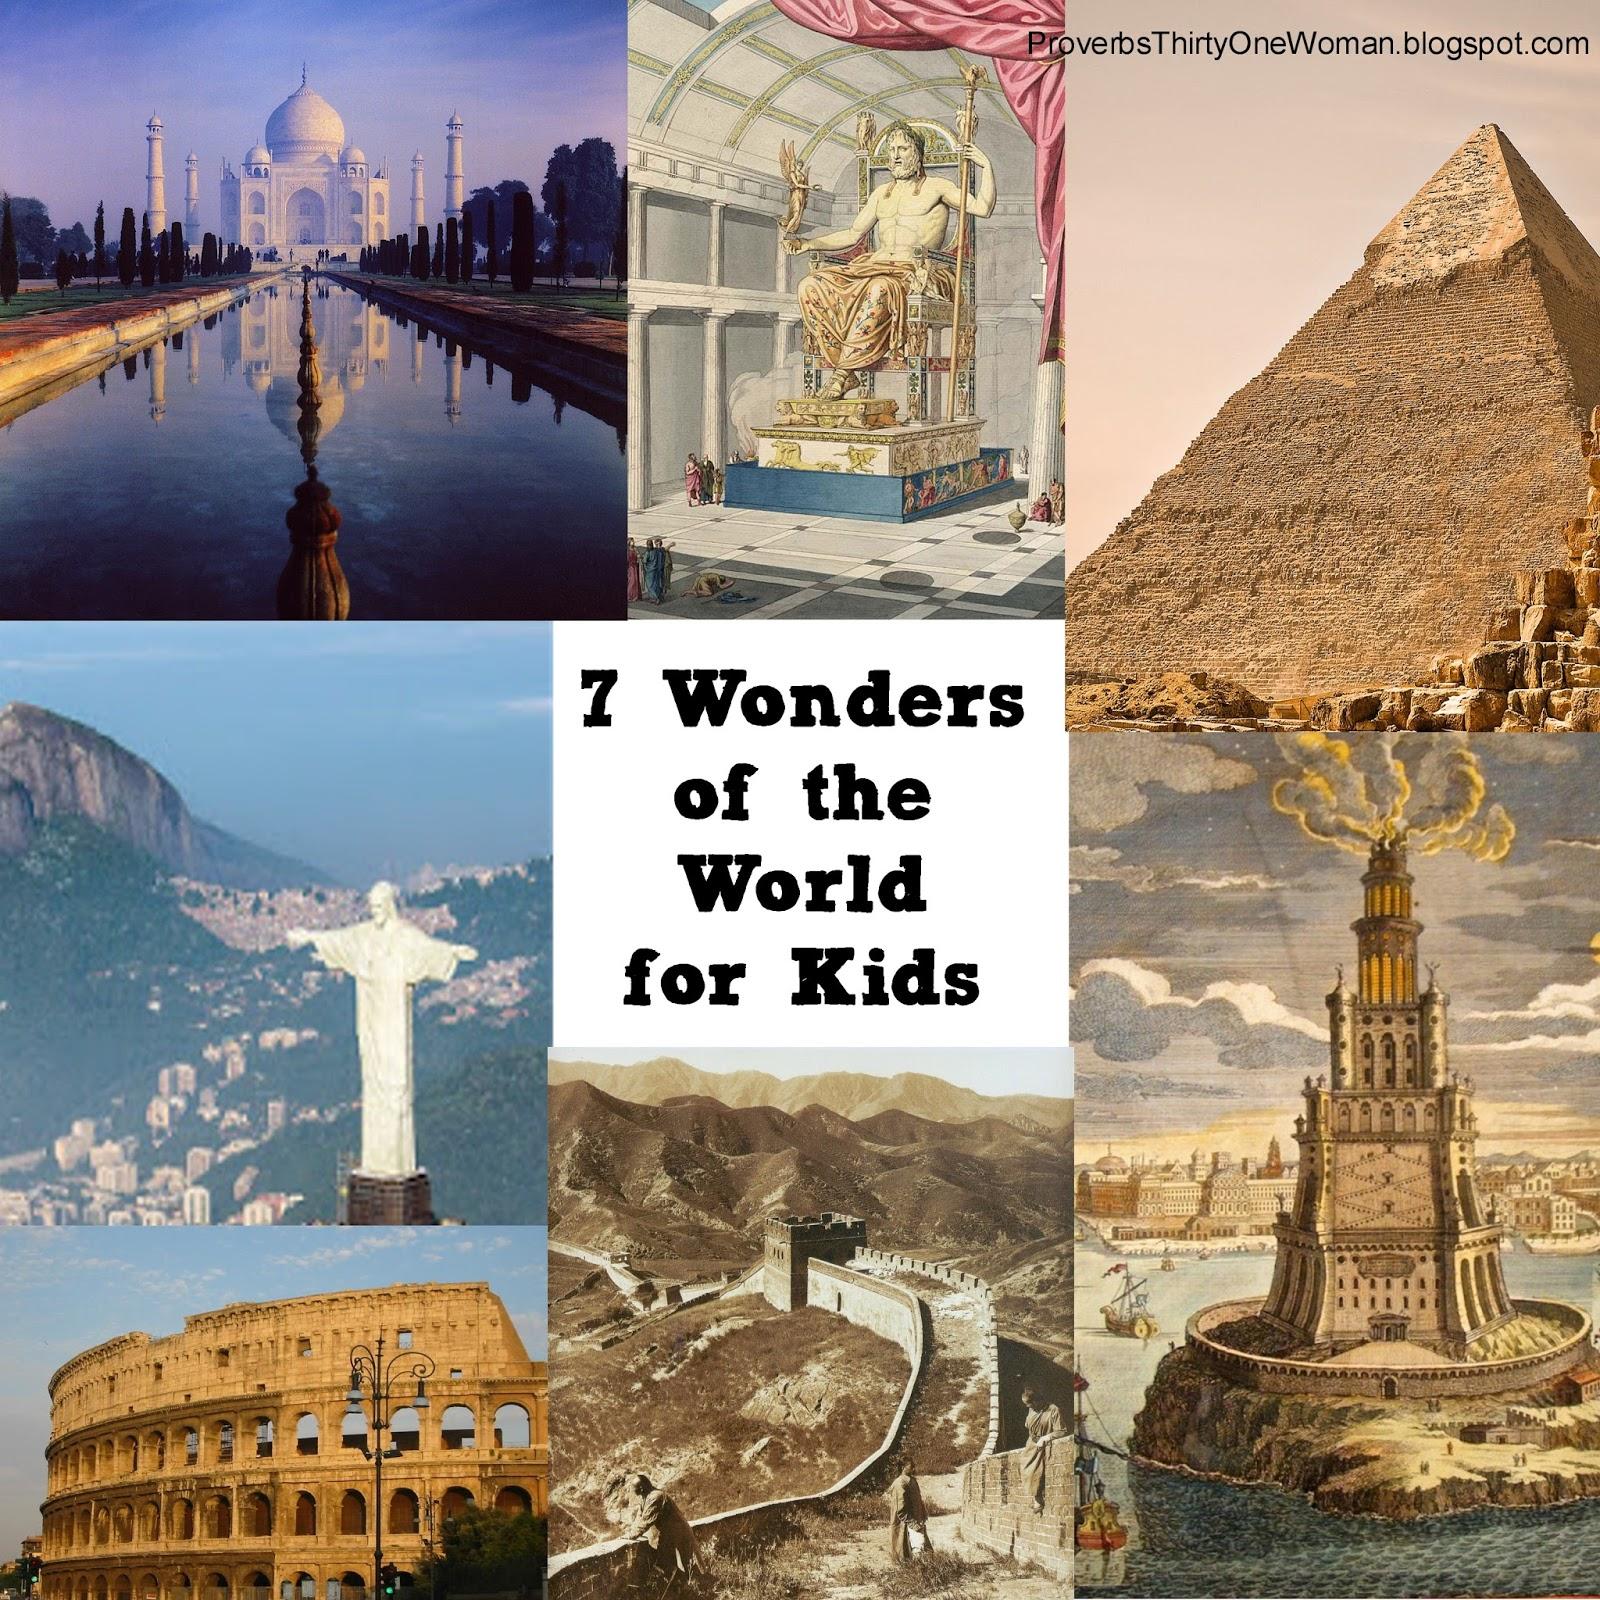 Colosseum clipart wonders the world School the or Break School